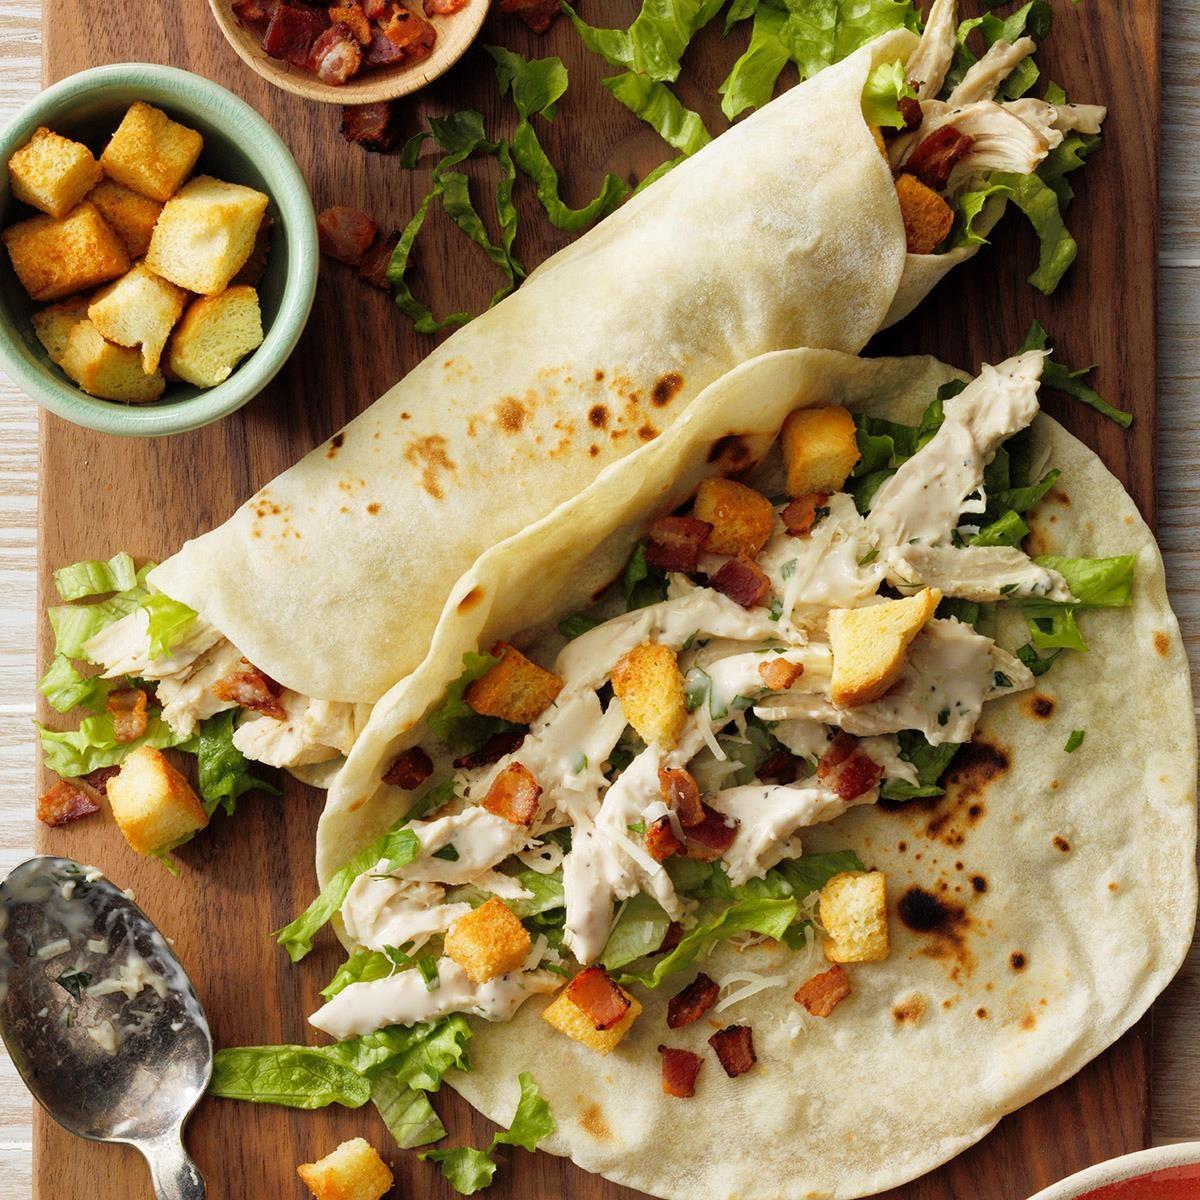 42 Summer Lunch Ideas That Ll Brighten Your Day Taste Of Home